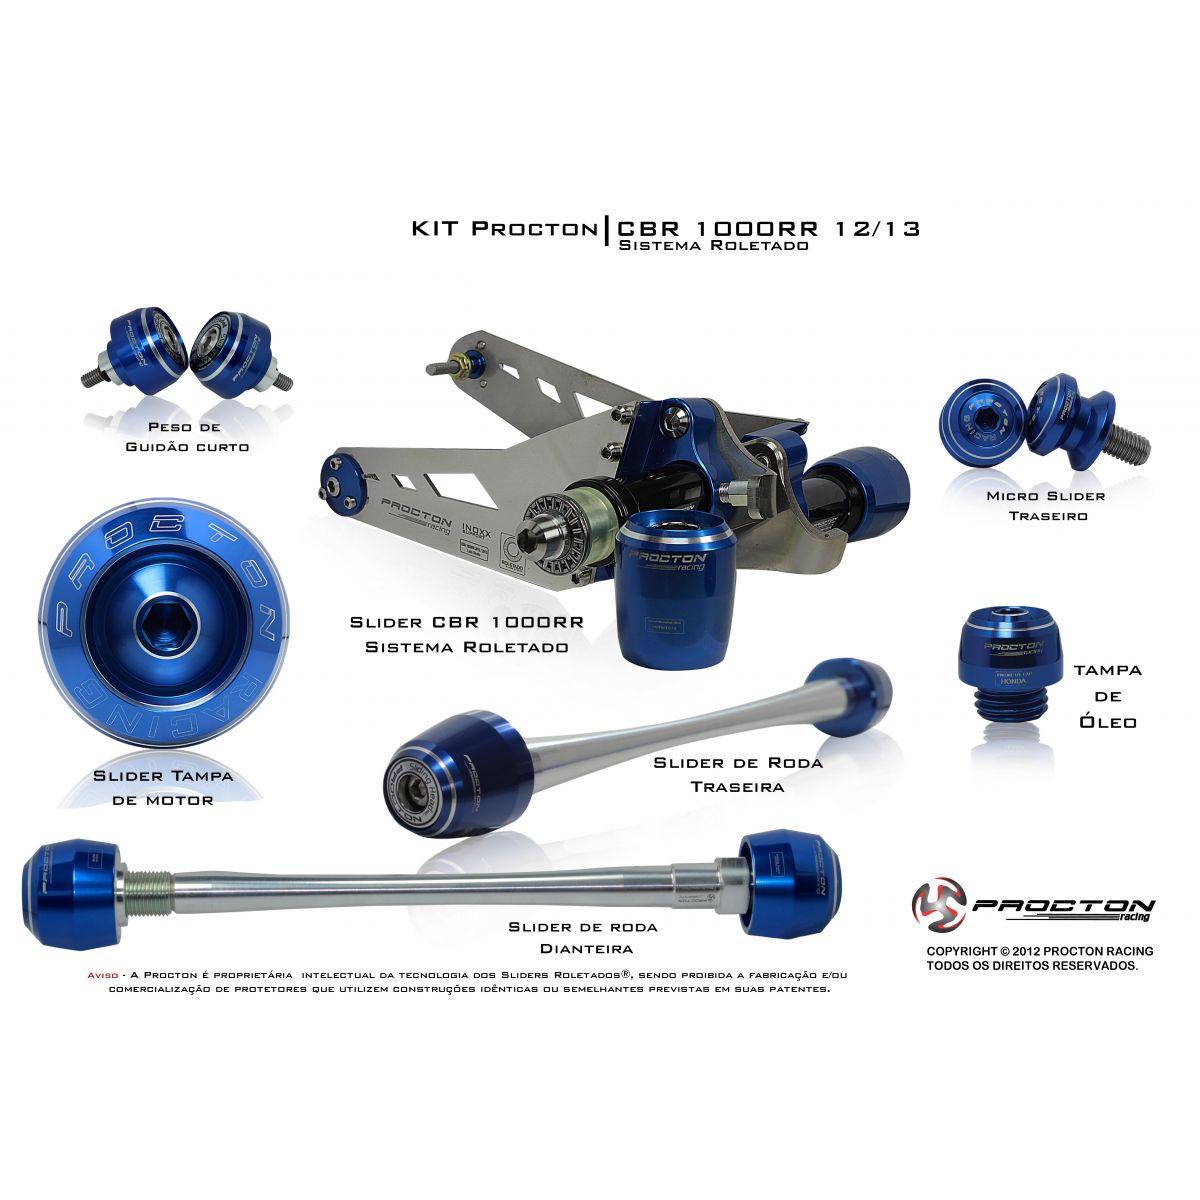 KIT Procton CB1000R  - Nova Suzuki Motos e Acessórios